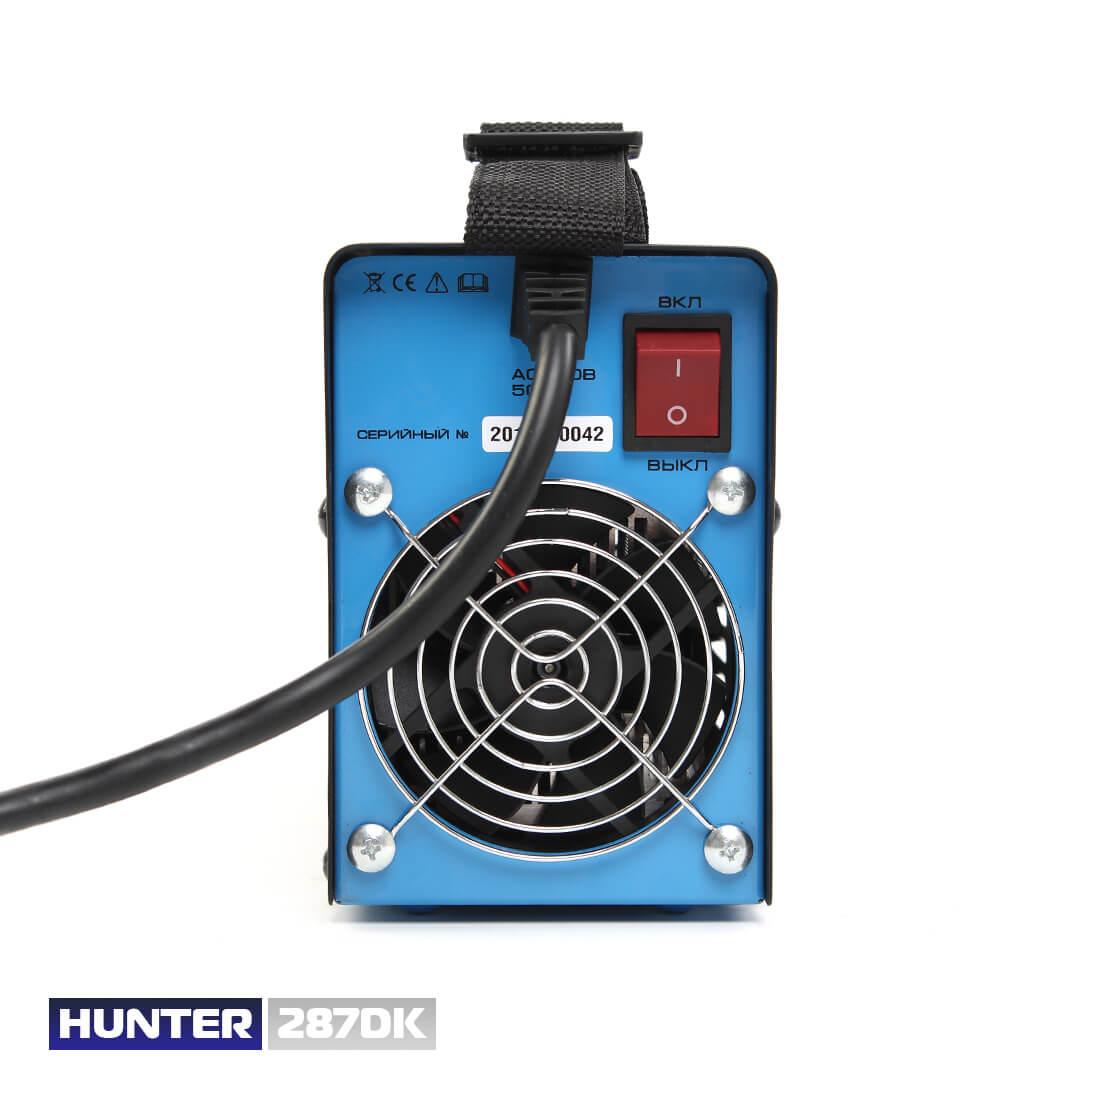 Фото Hunter MMA 287DK (дуговая) цена 2550грн №3 — Hunter